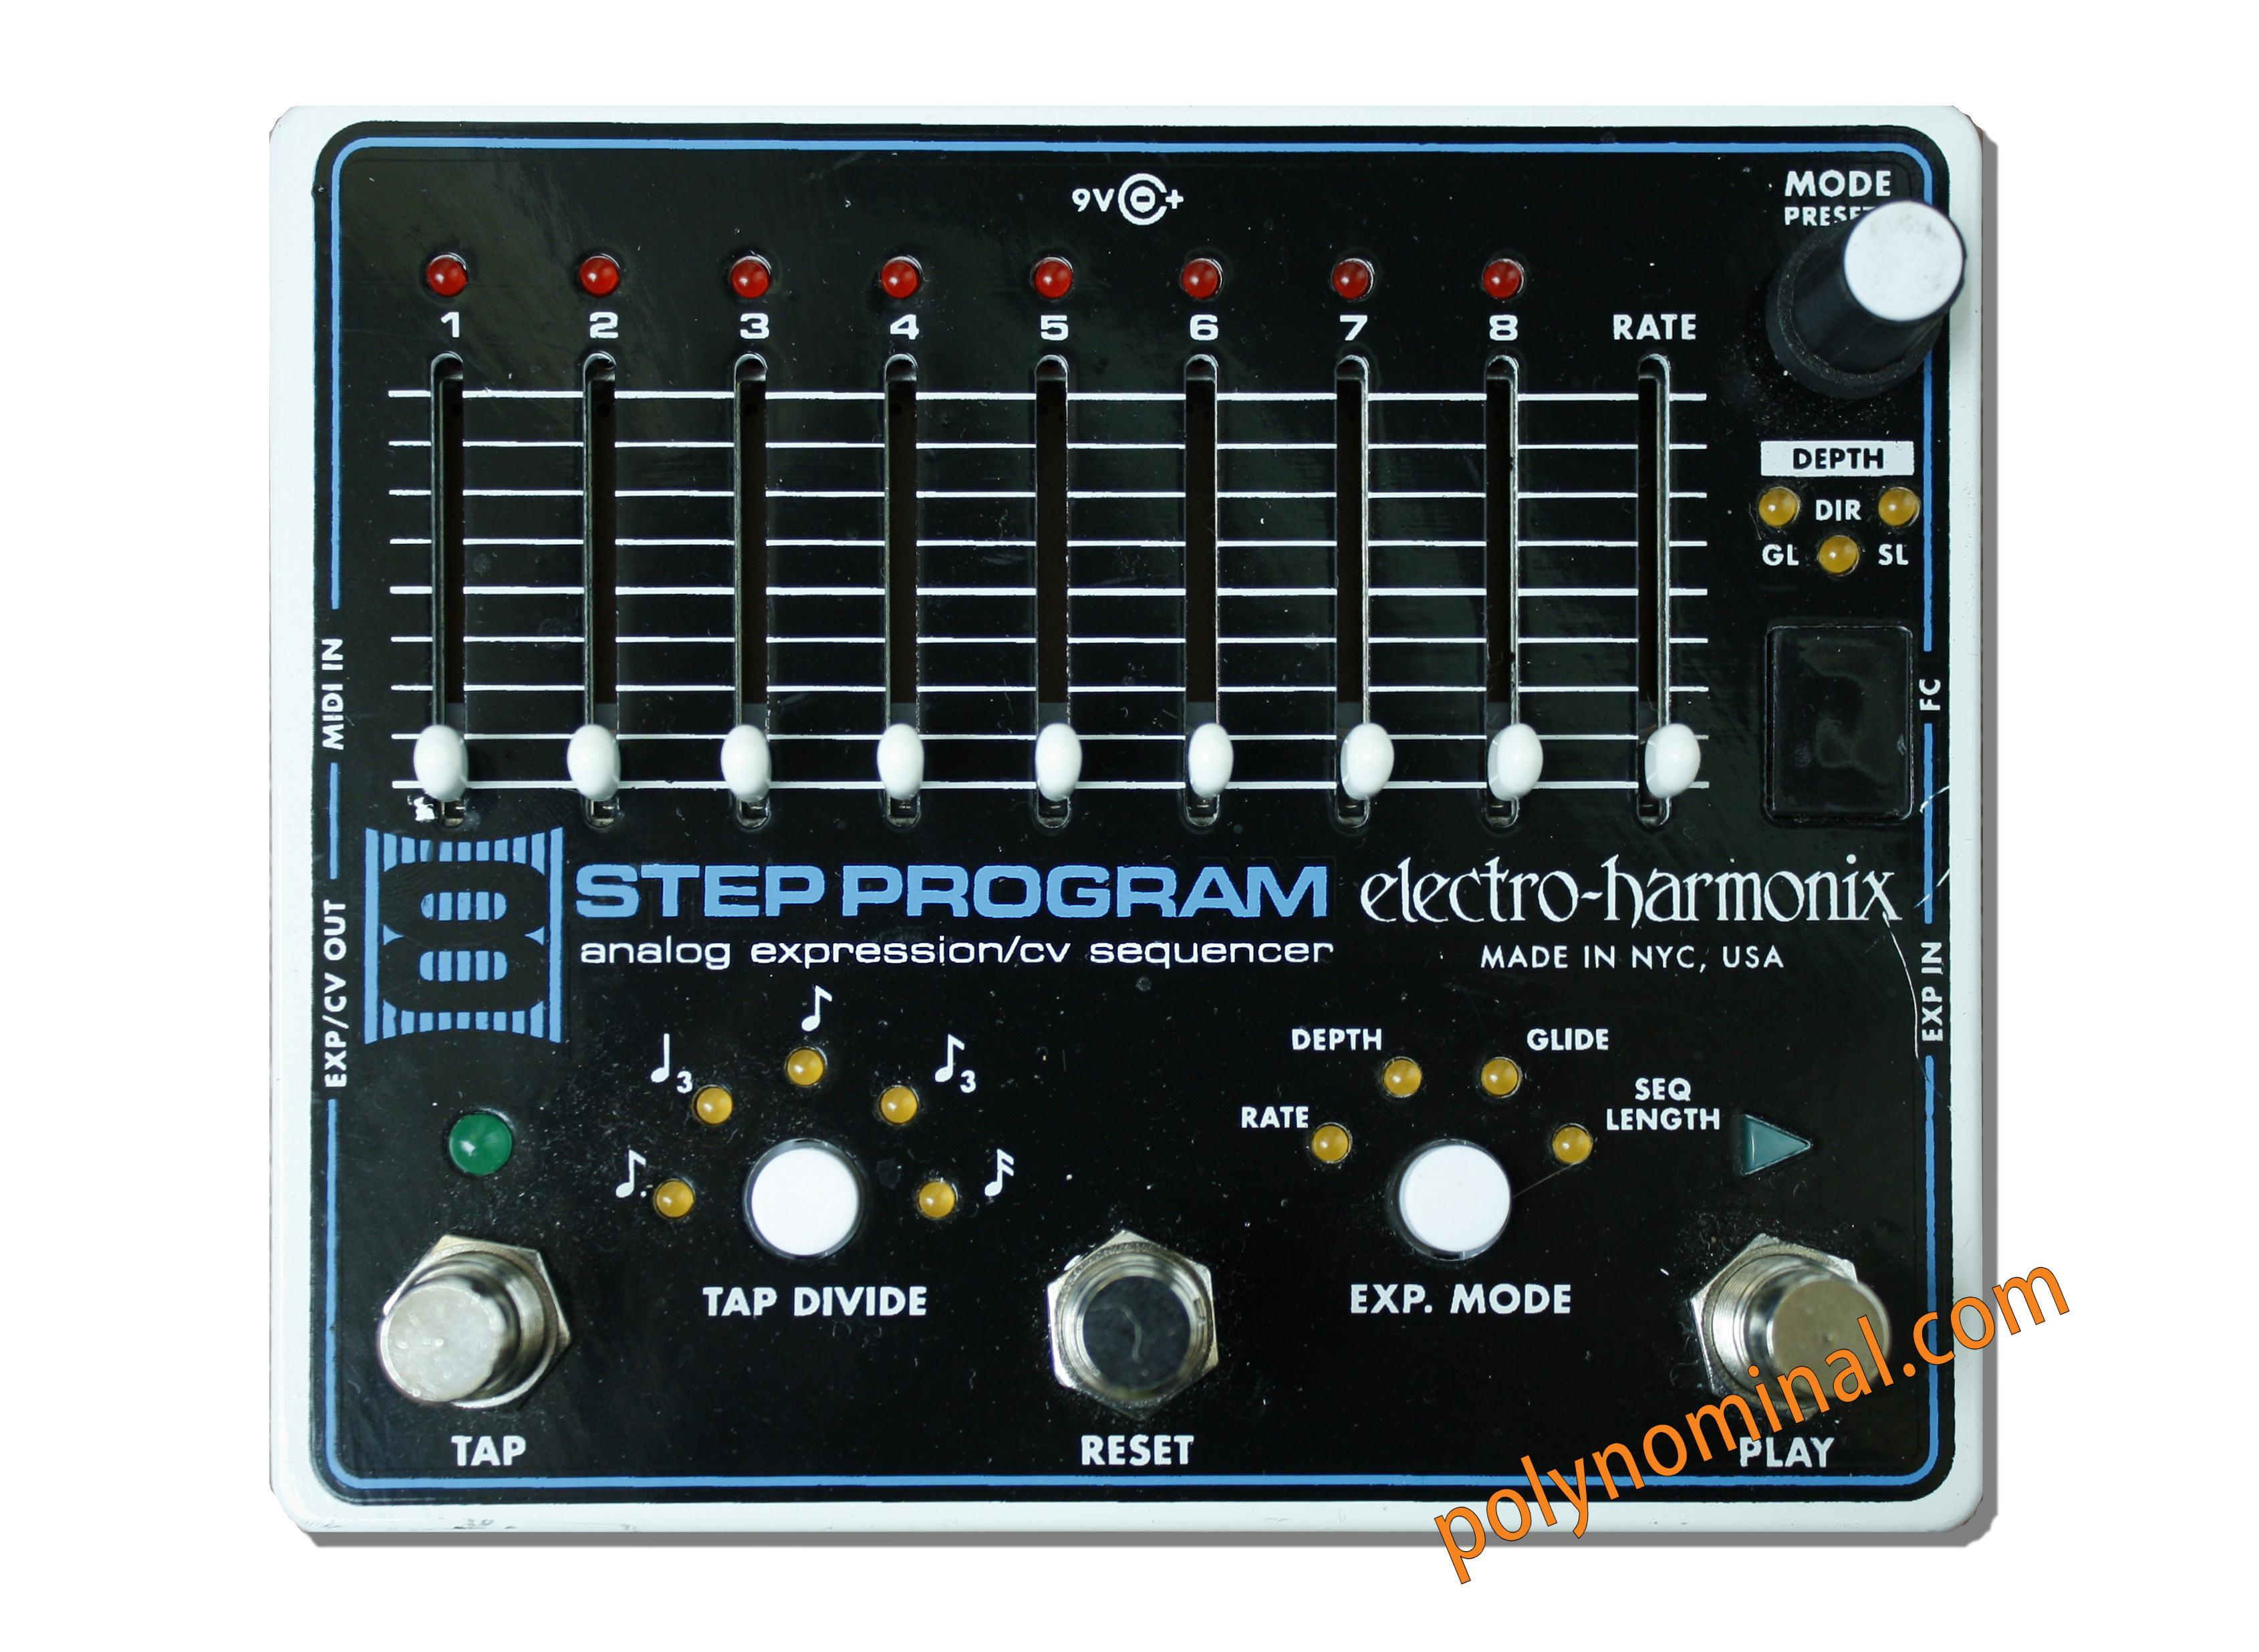 8 Step Program Analog Expression / CV ... - Electro-Harmonix